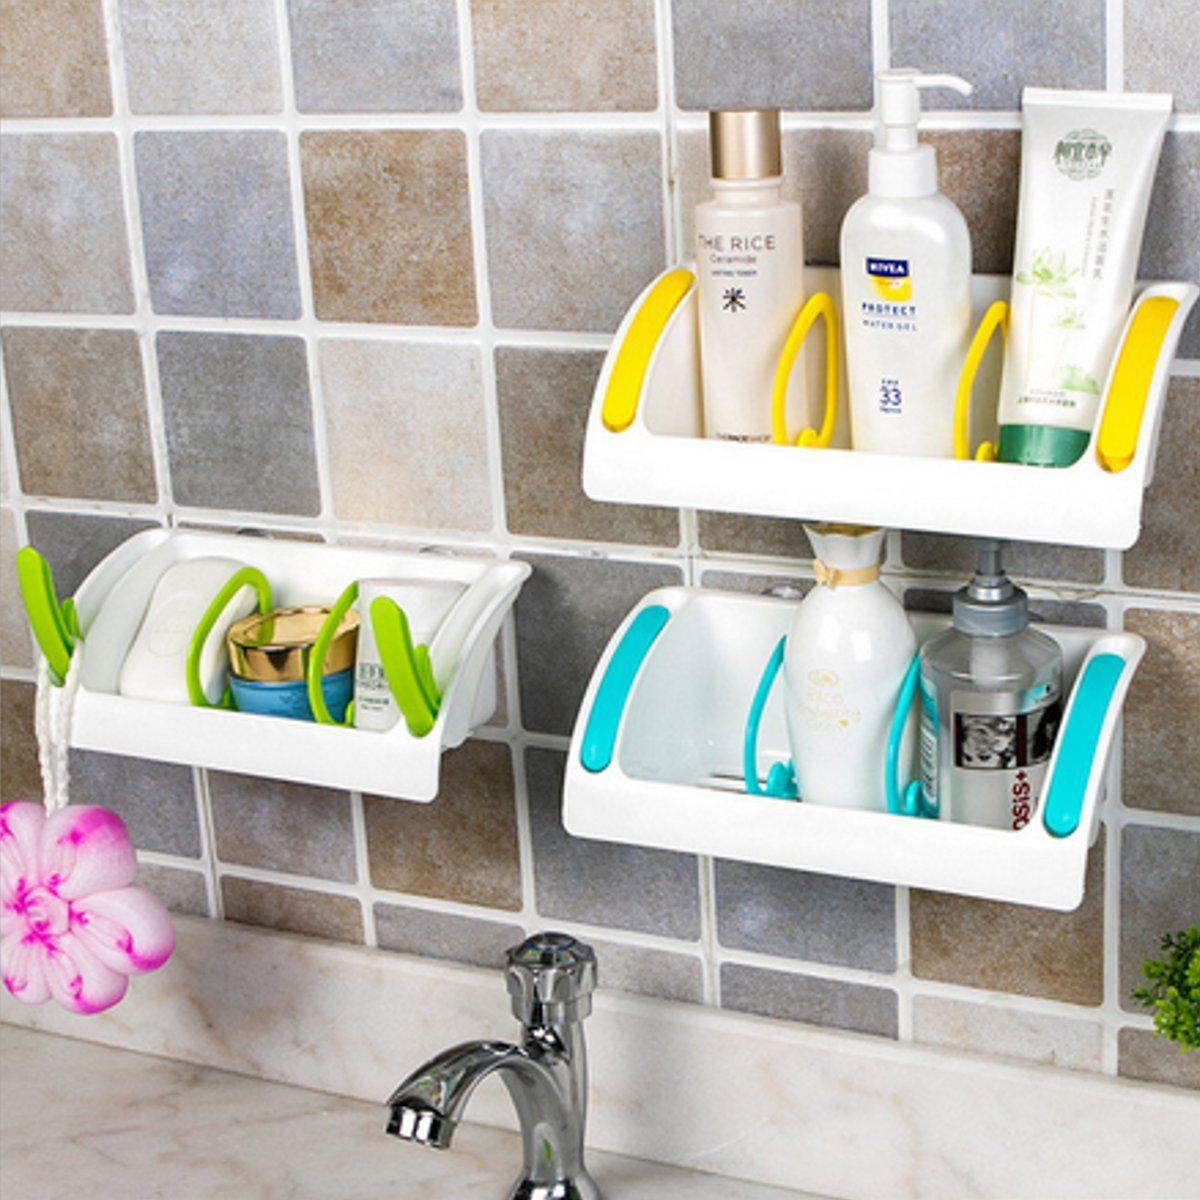 1pcs kitchen sink suction cup bathroom storage shelf rack home bathroom sundries holder organiser tray. Interior Design Ideas. Home Design Ideas